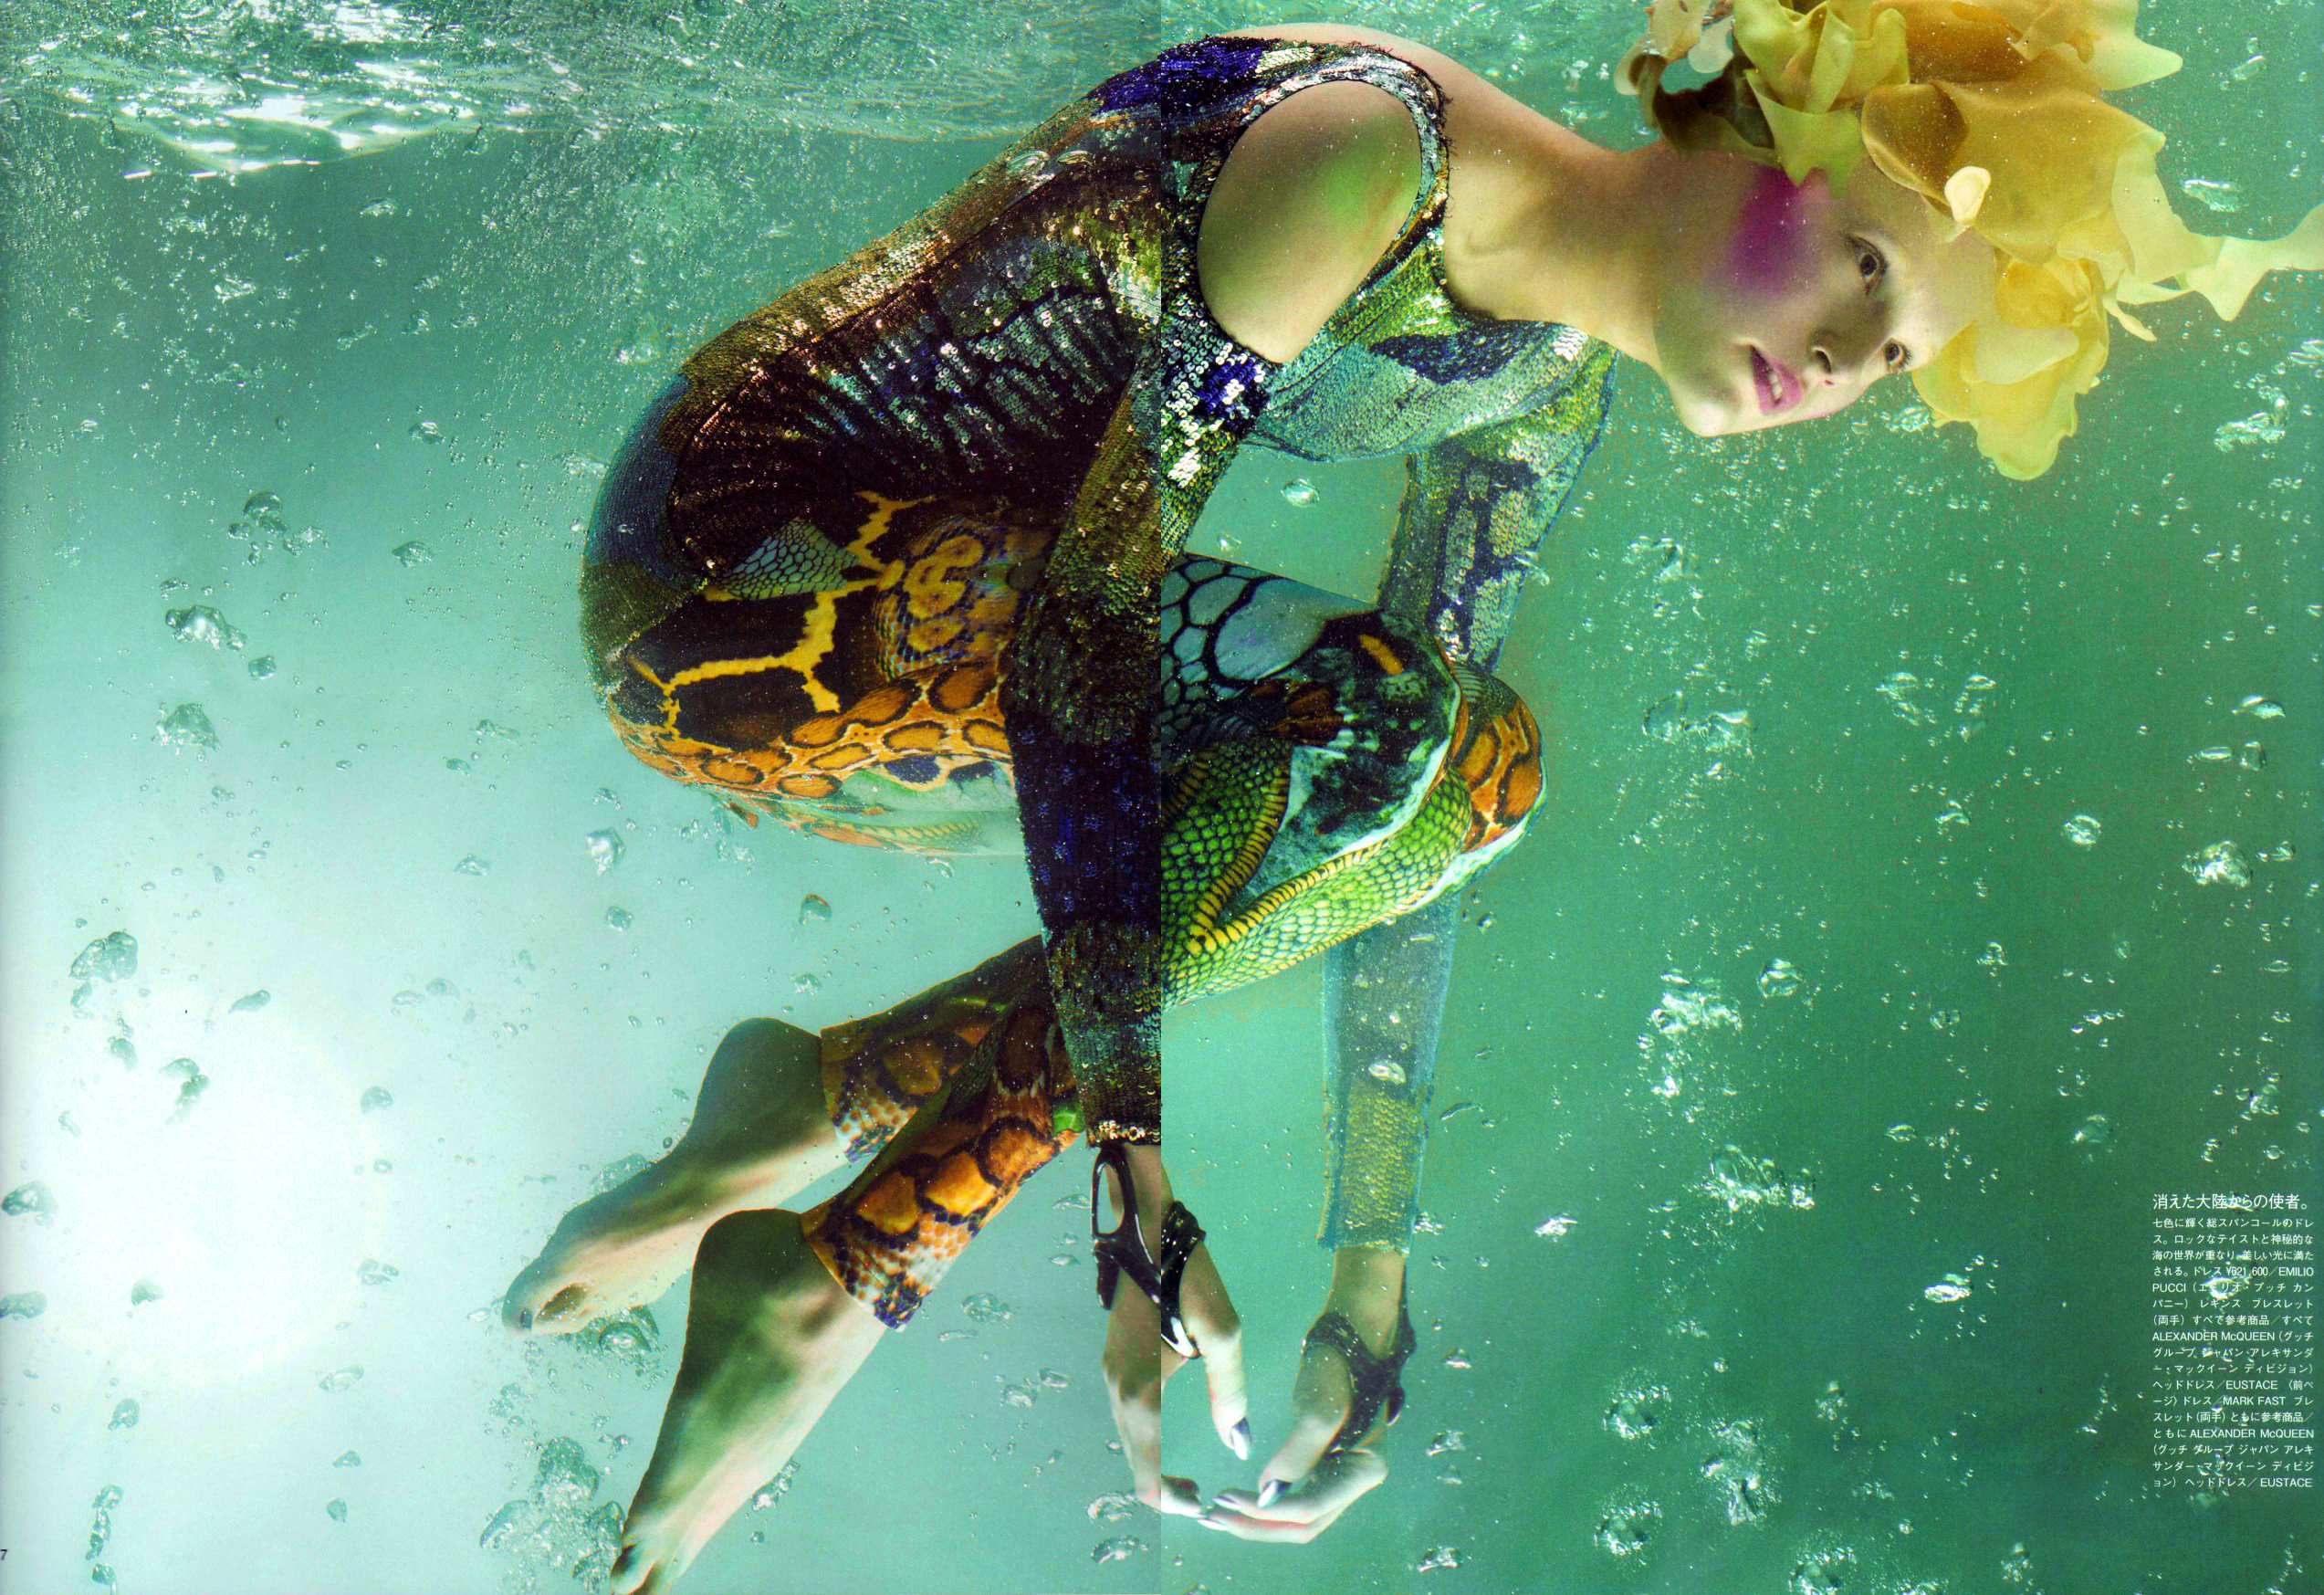 """The Girl From Atlantis"" Vogue Nippon May 2010, Model: Alia Kostromichova, Photographer: Solve Sundsbo"